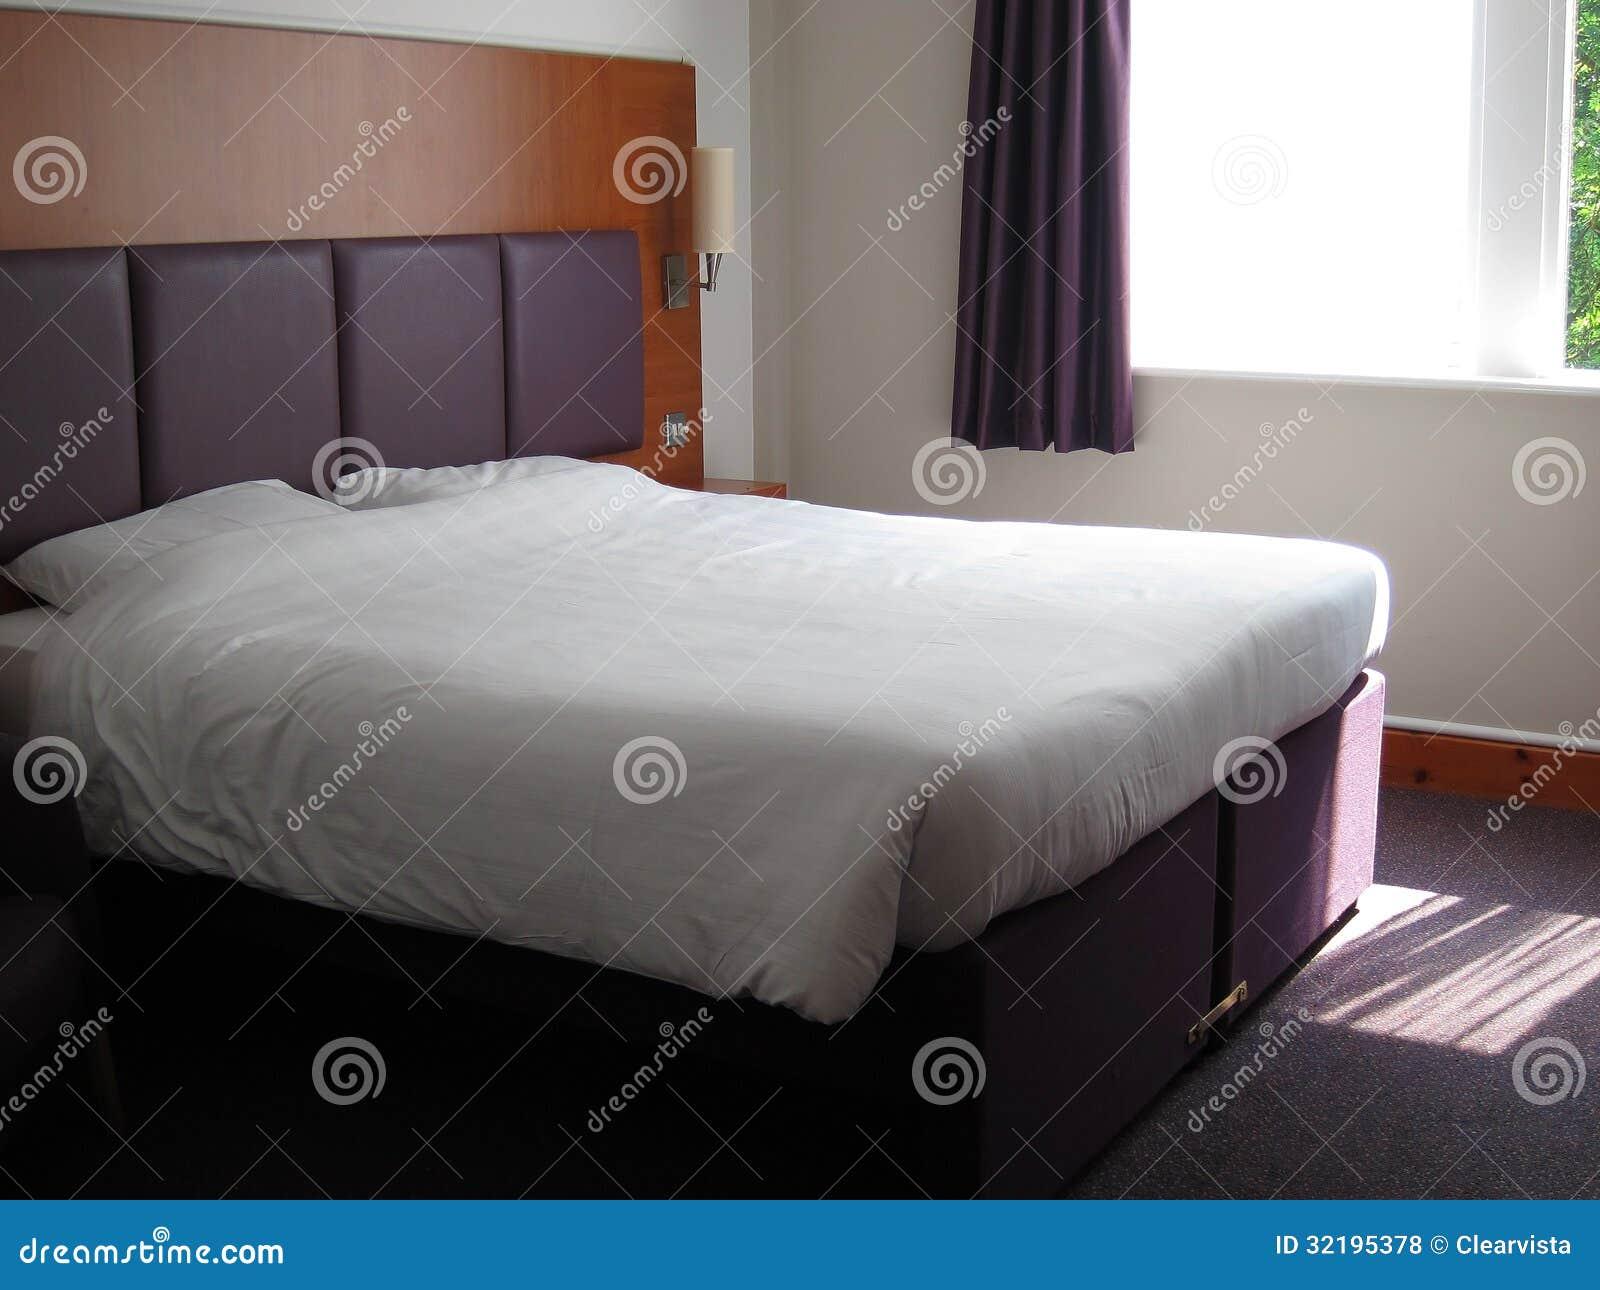 cama matrimonial grande fotos de archivo libres de